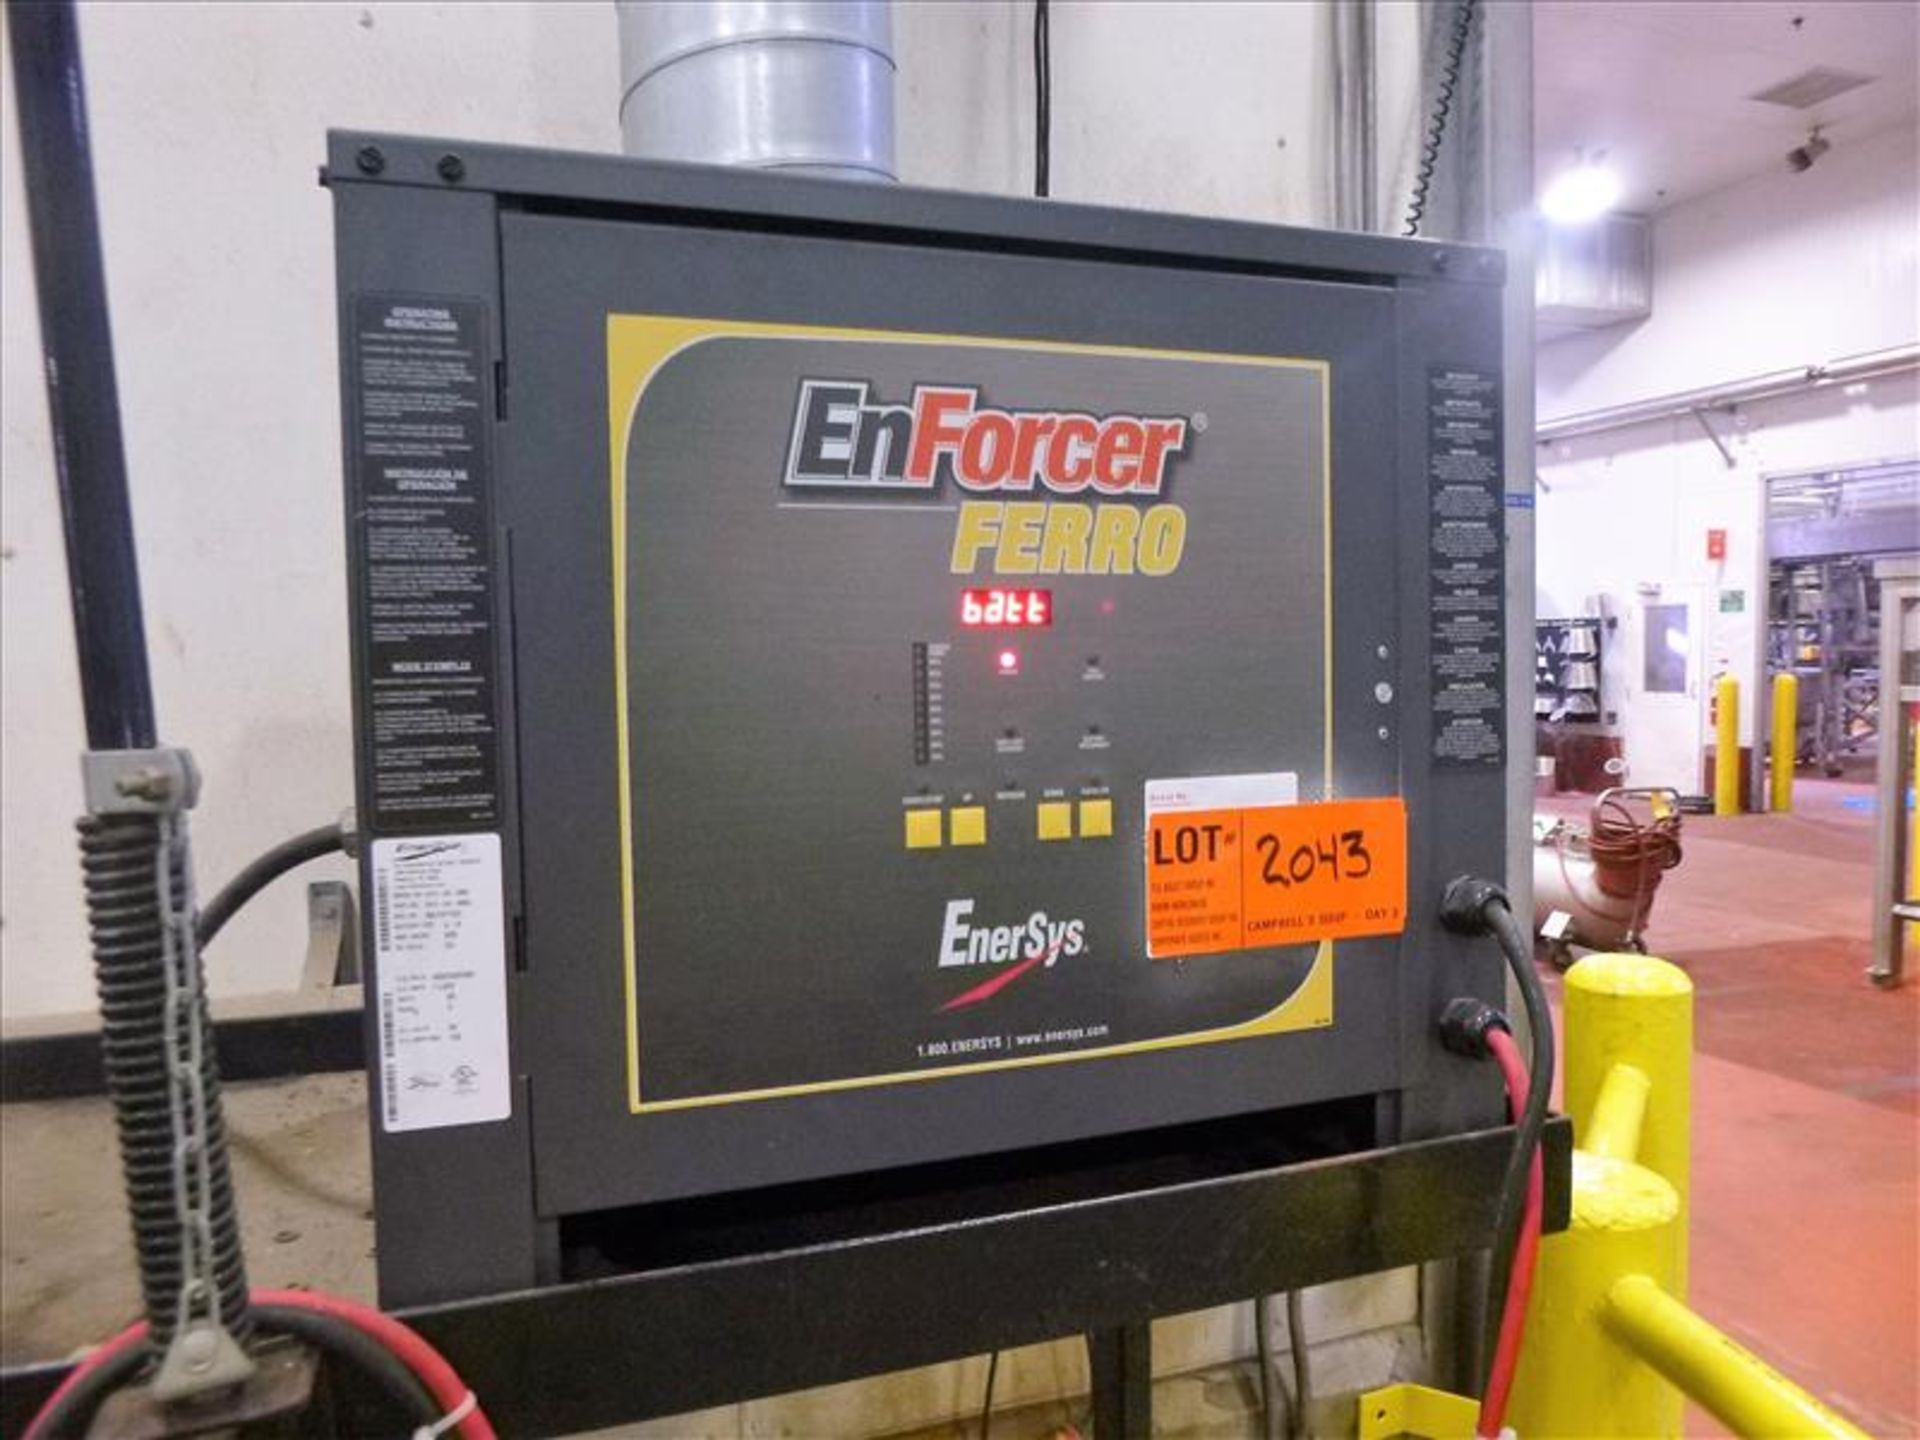 Enforcer Ferro battery charger, 48V [Material Handling]